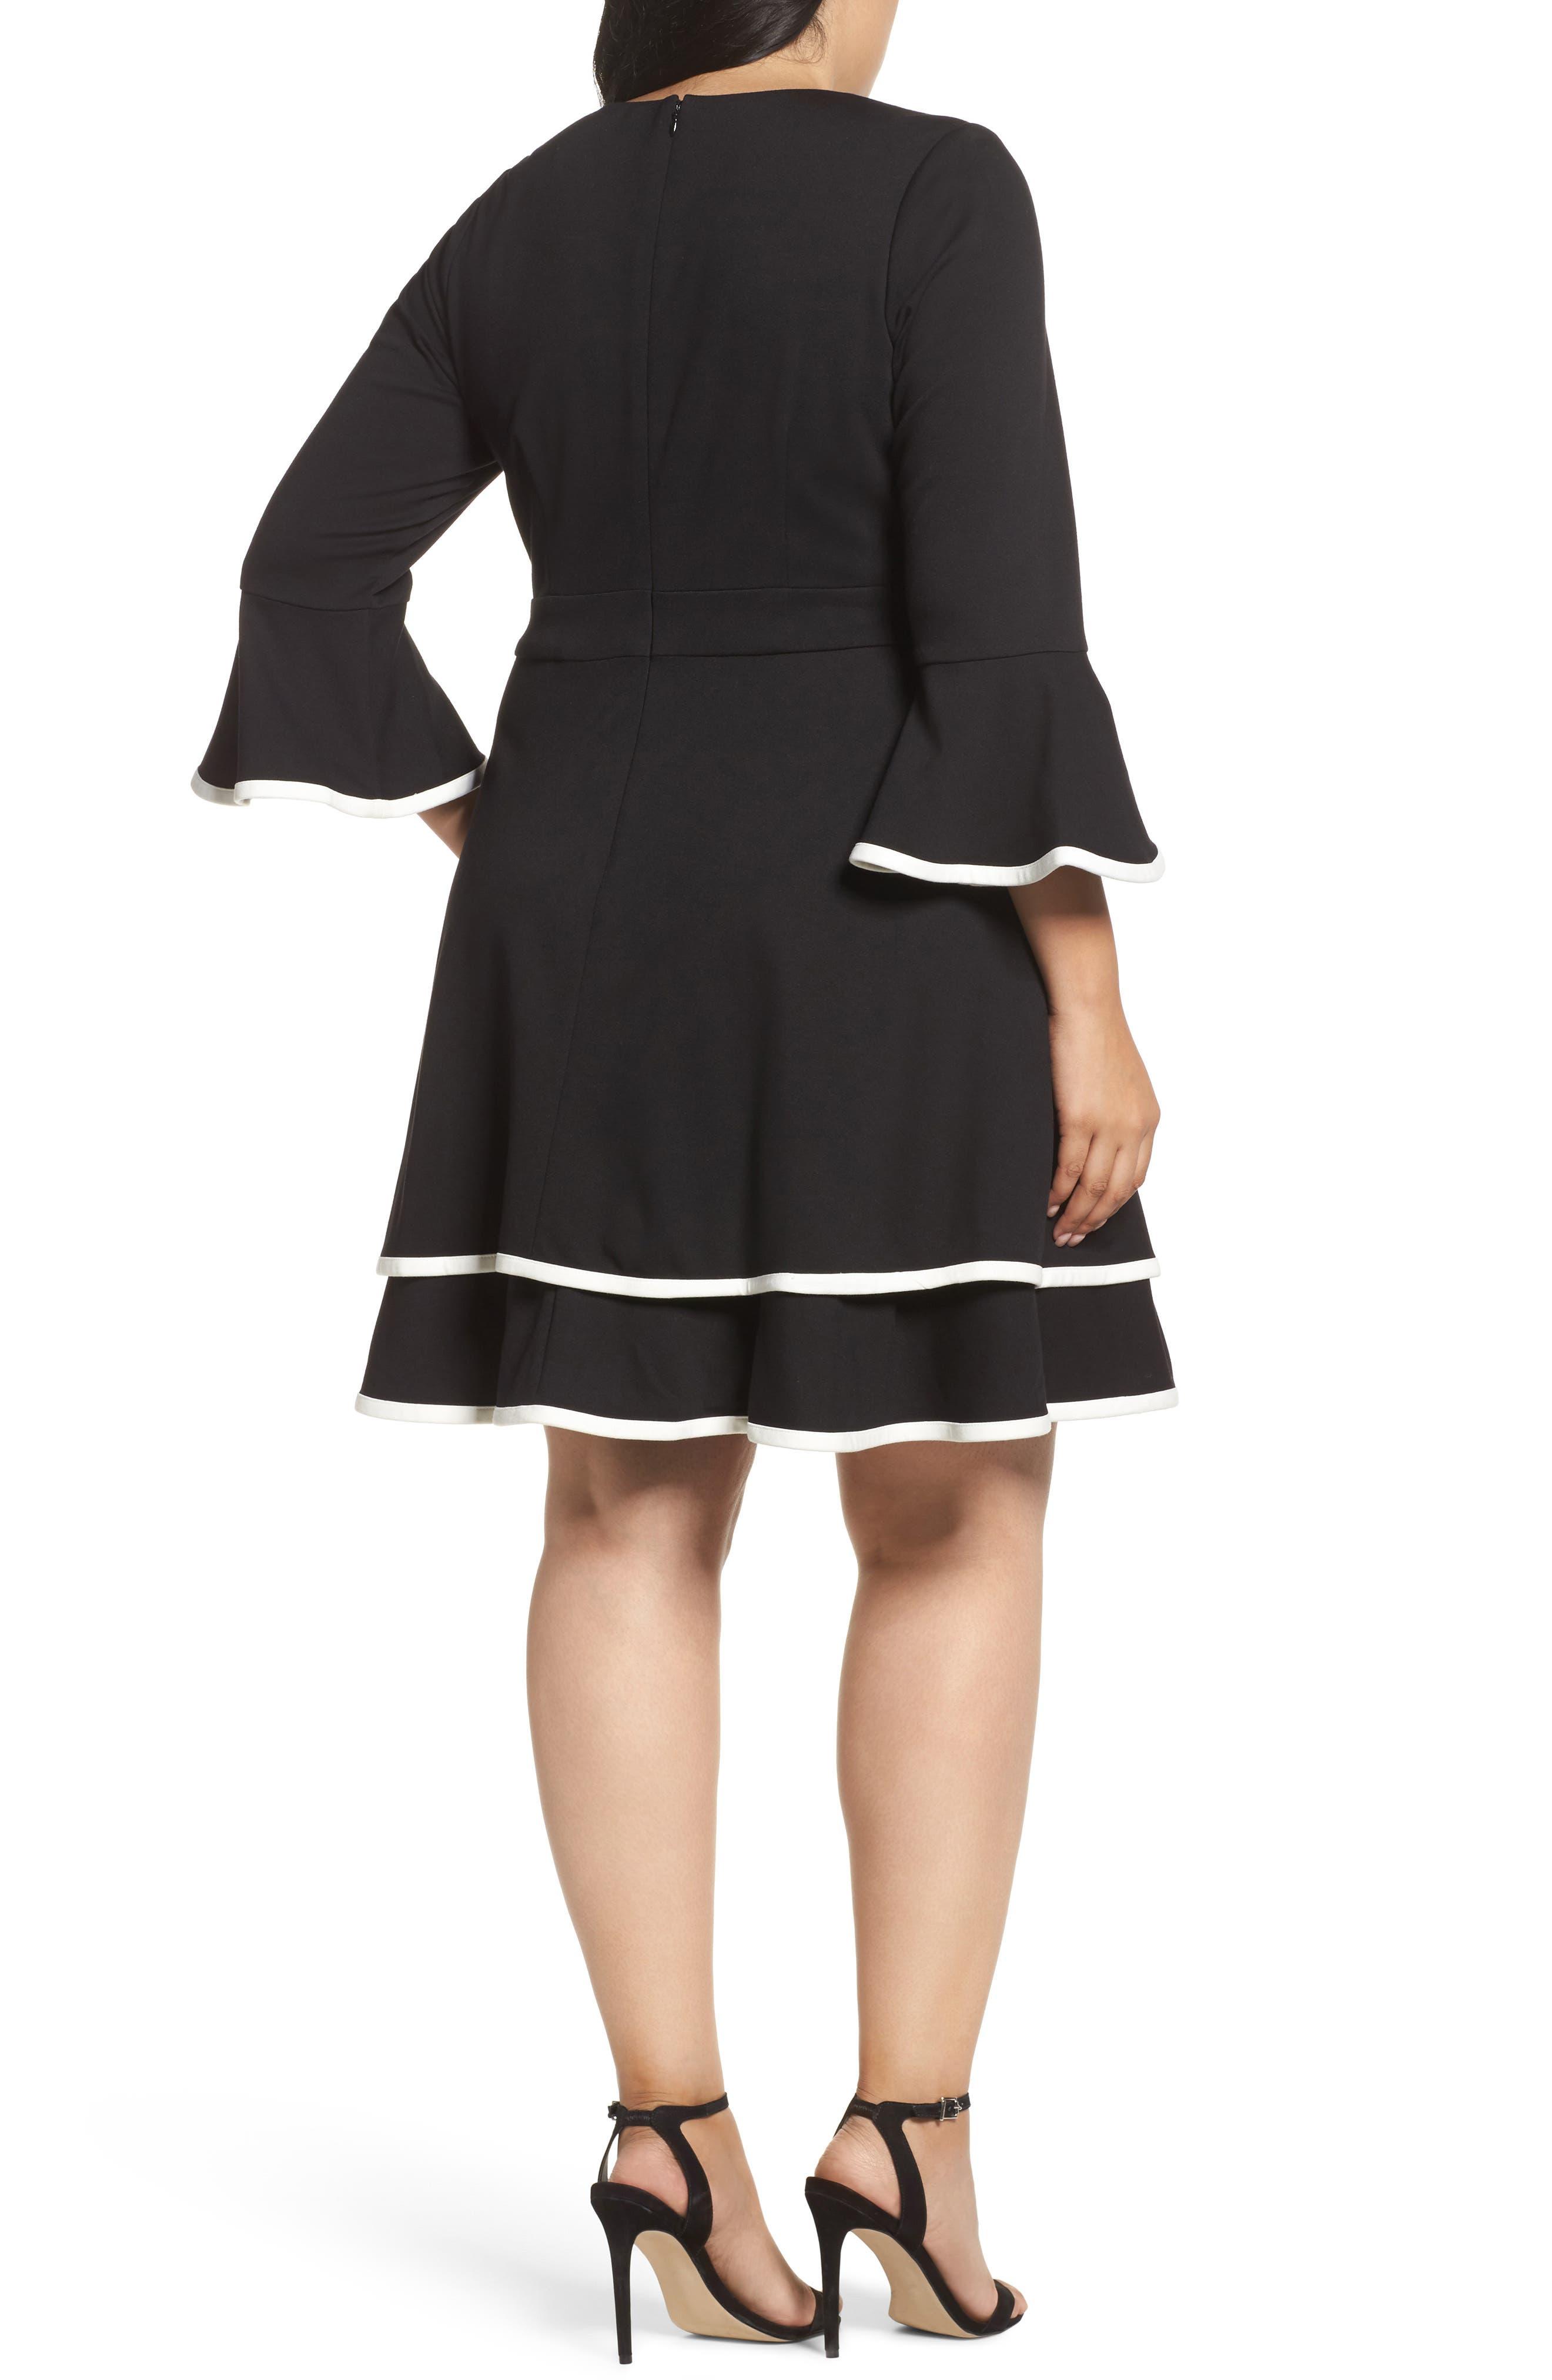 Bell Sleeve Contrast Trim Fit & Flare Dress,                             Alternate thumbnail 2, color,                             BLACK/ IVORY